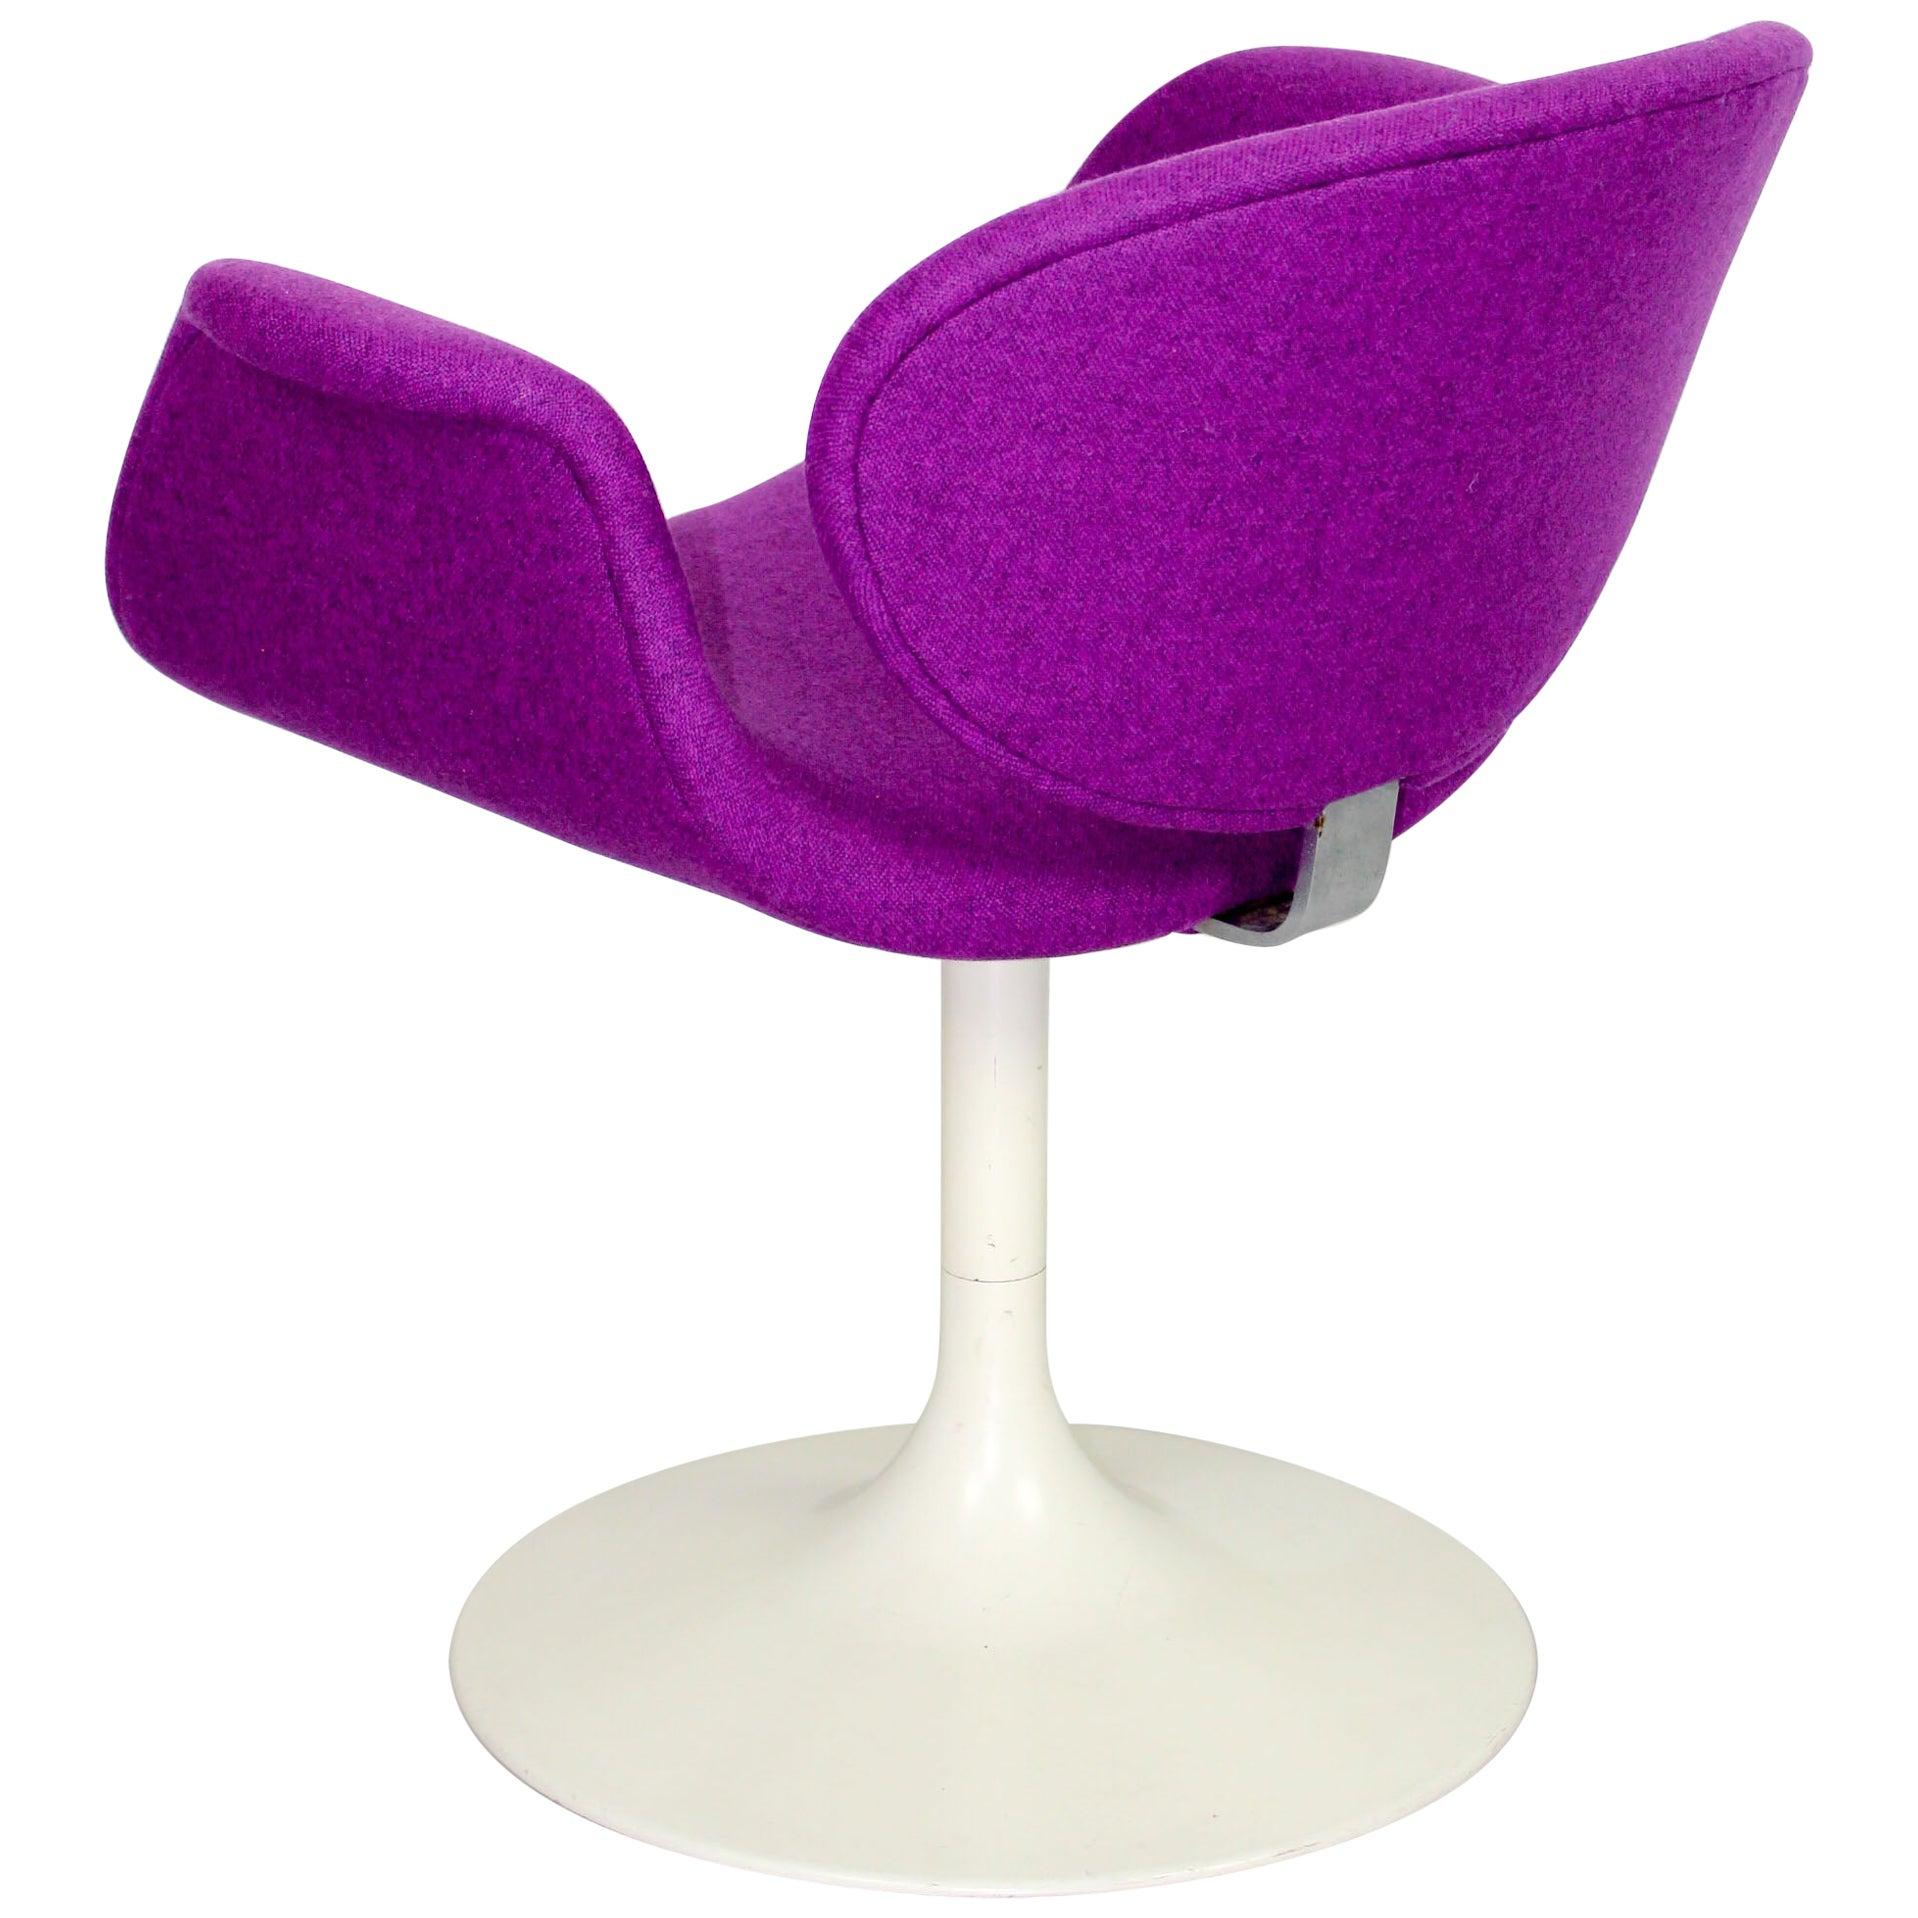 Early Pierre Paulin Little Tulip Chair for Artifort in Kvadrat Divina